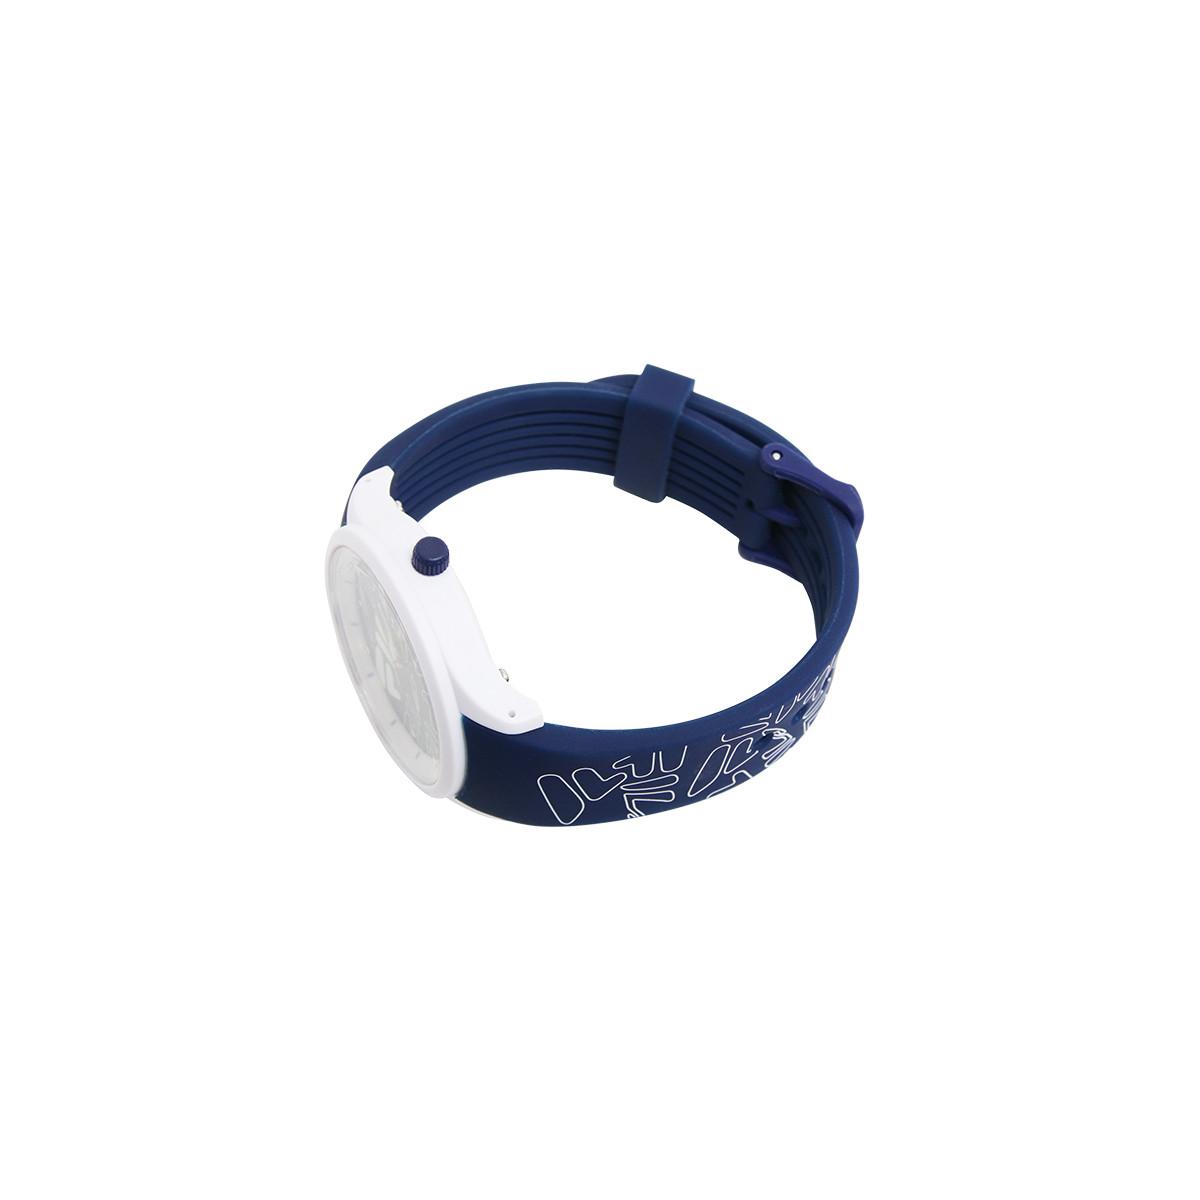 Montre homme FILA cadran bleu - 38-129-203